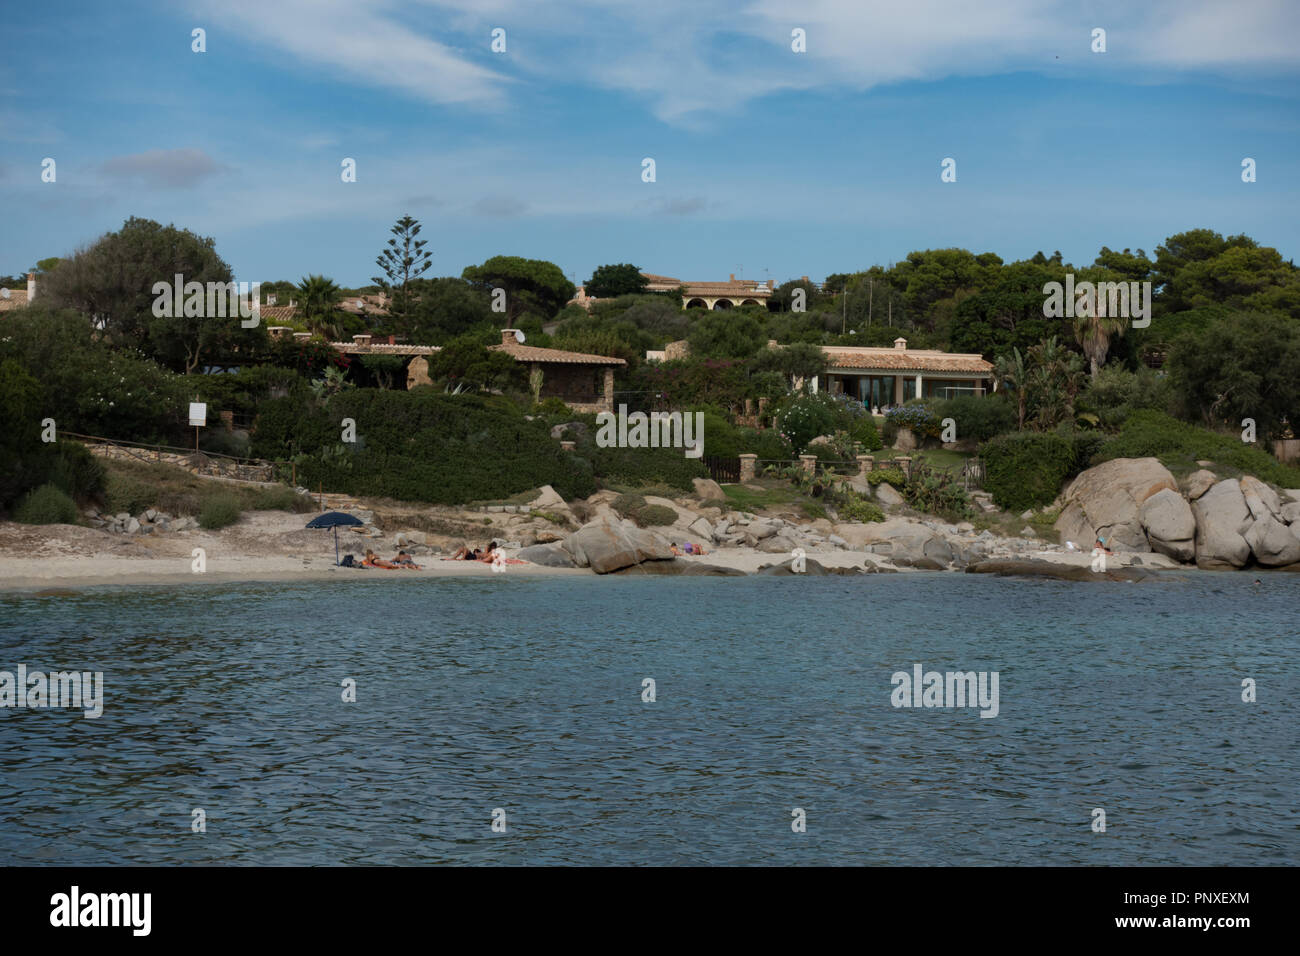 Coastal development. Southern Sardinia. Italy - Stock Image